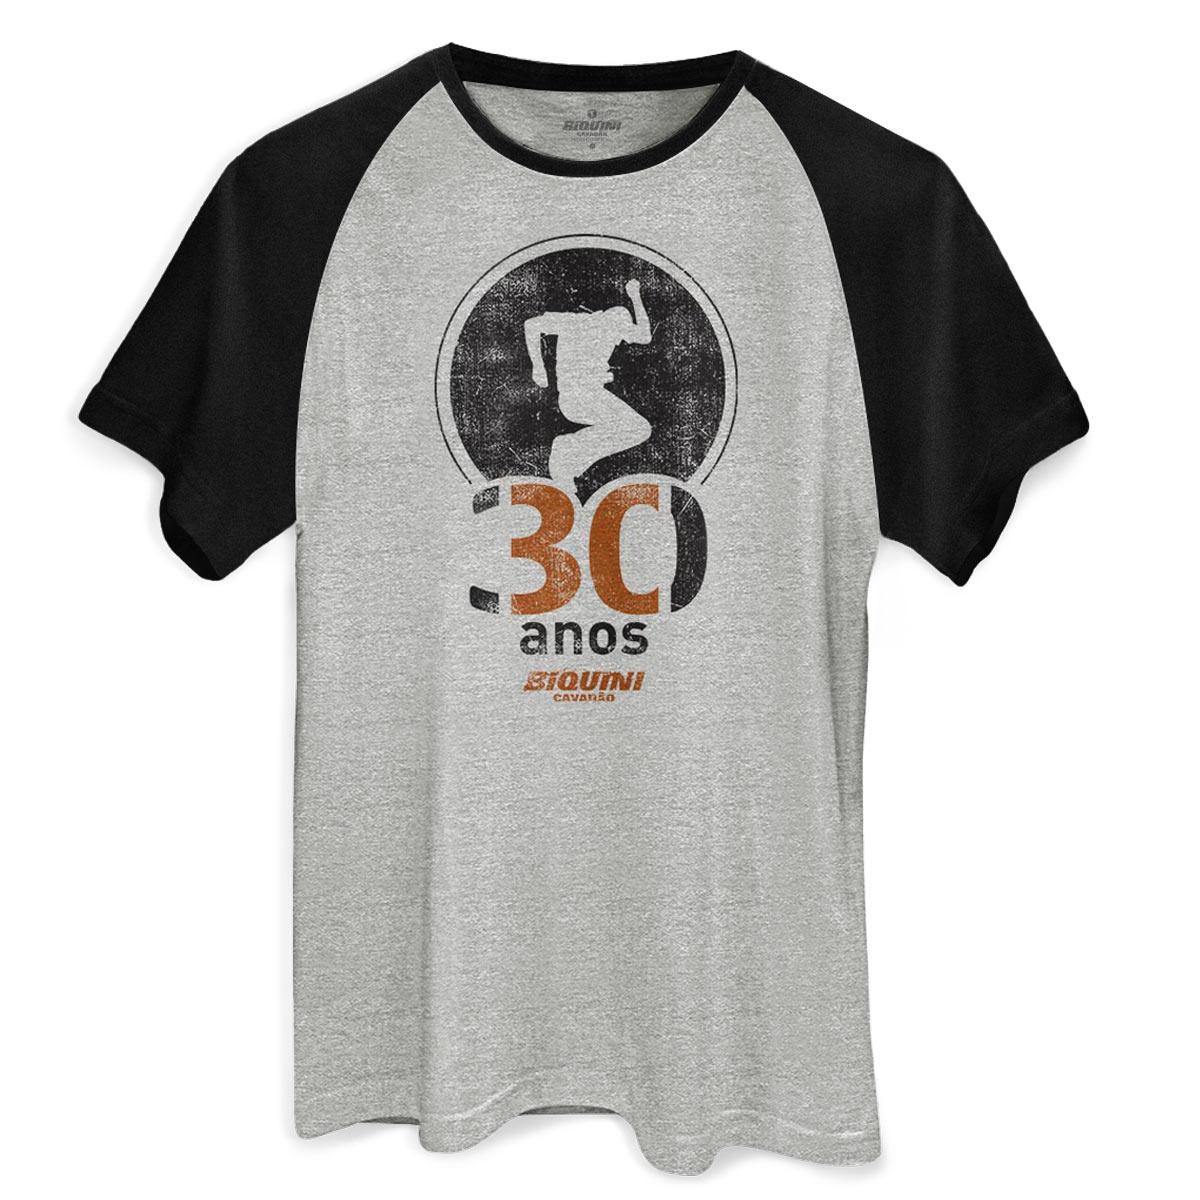 Camiseta Raglan Masculina Biquini Cavadão 30 Anos